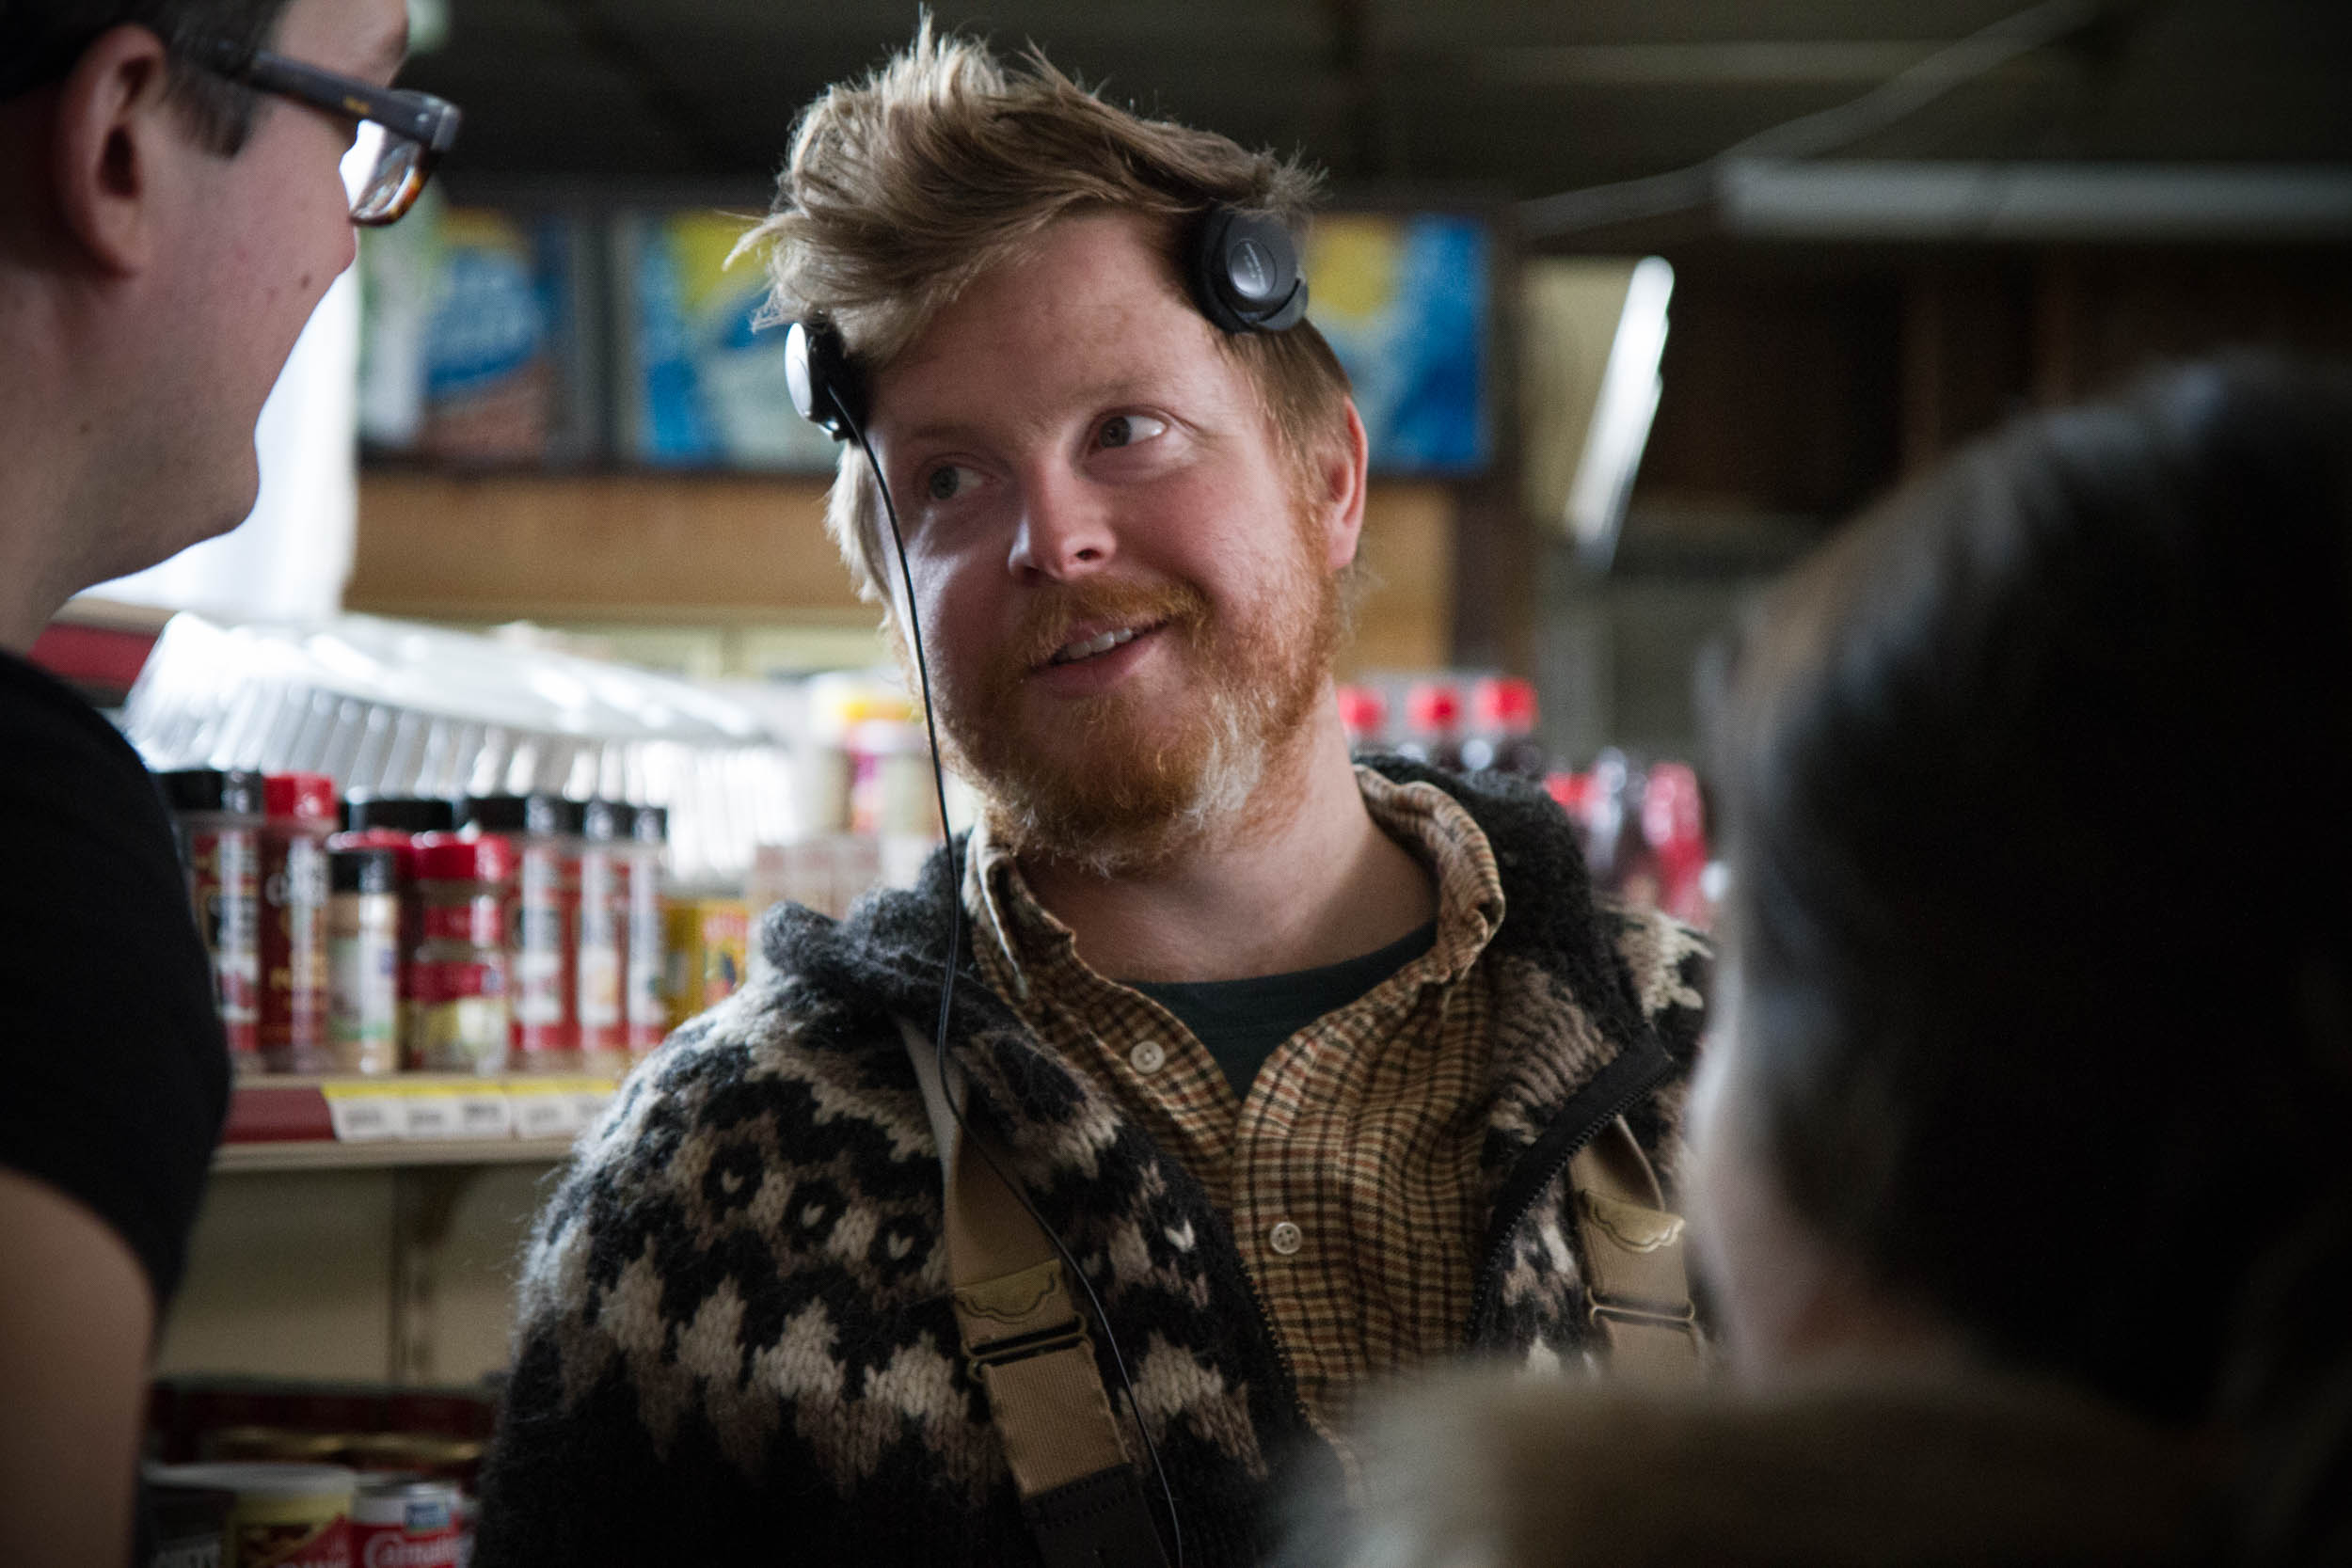 production designer james bolenbaugh and director kris thor in the supermarket